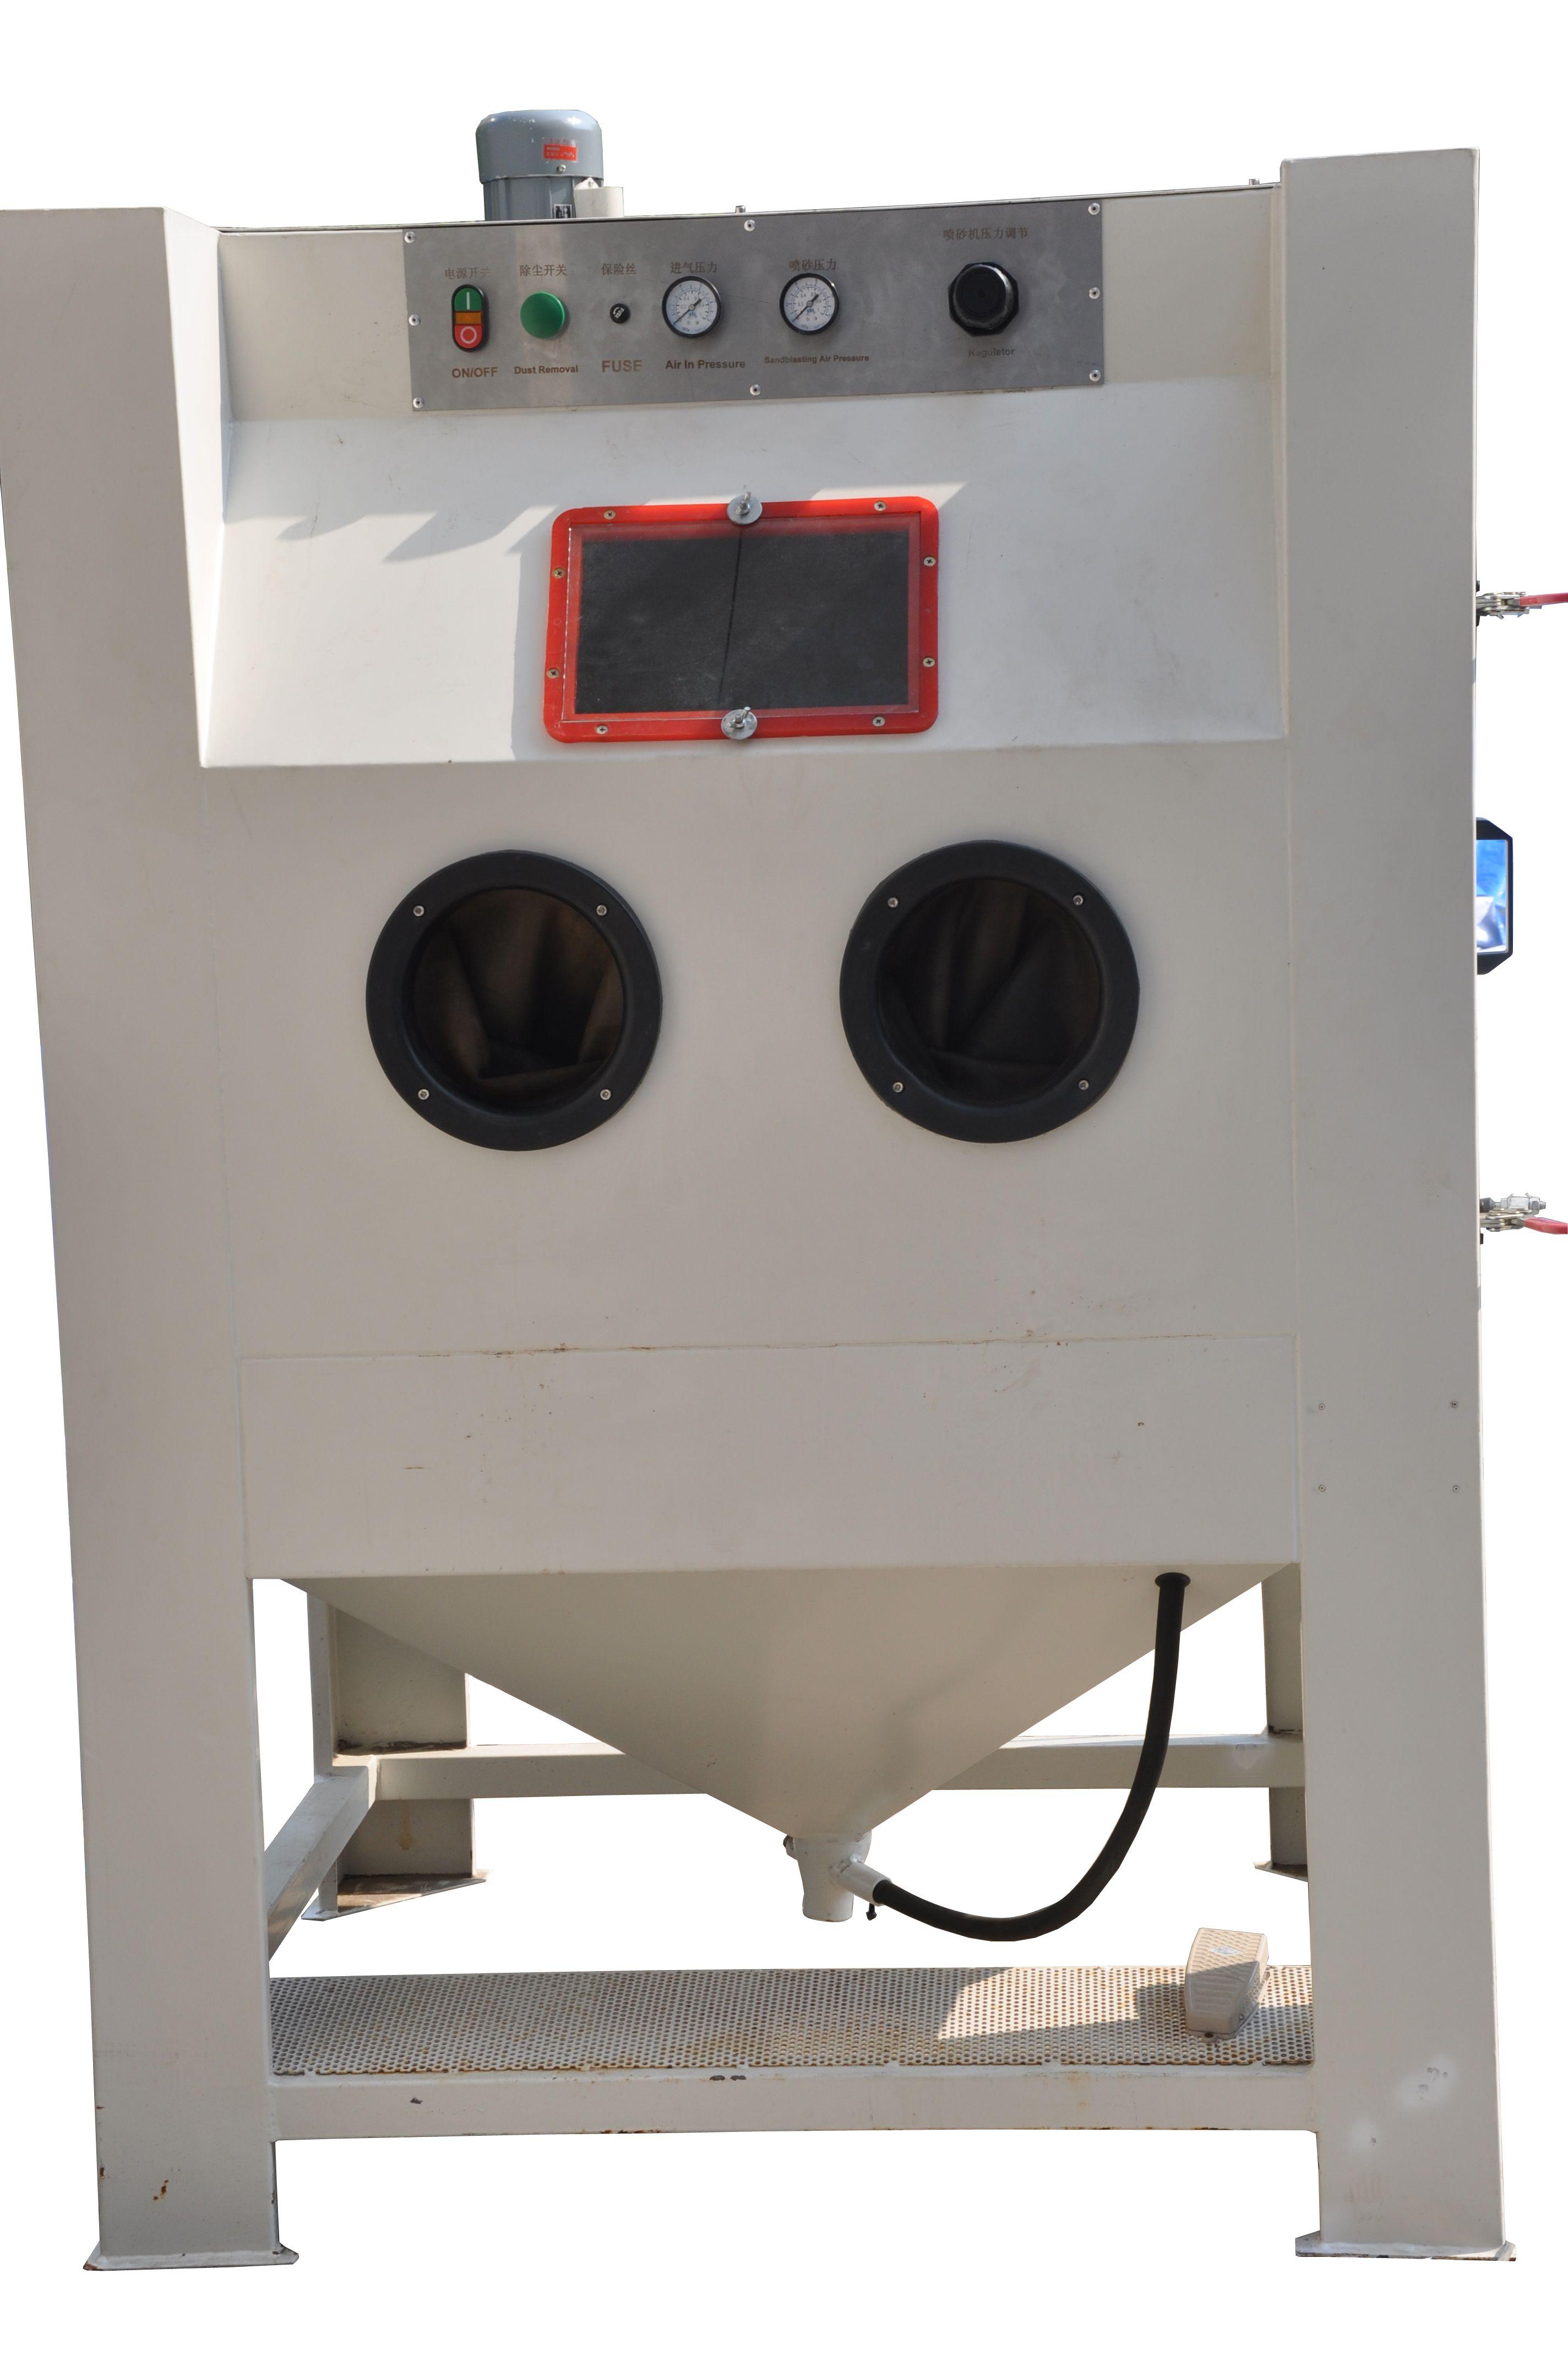 Suction Blast Cabinet Most Widely Used For Sandblasting Job Simple Structure And Econom Powder Coating Machine Powder Coating Equipment Sand Blasting Machine